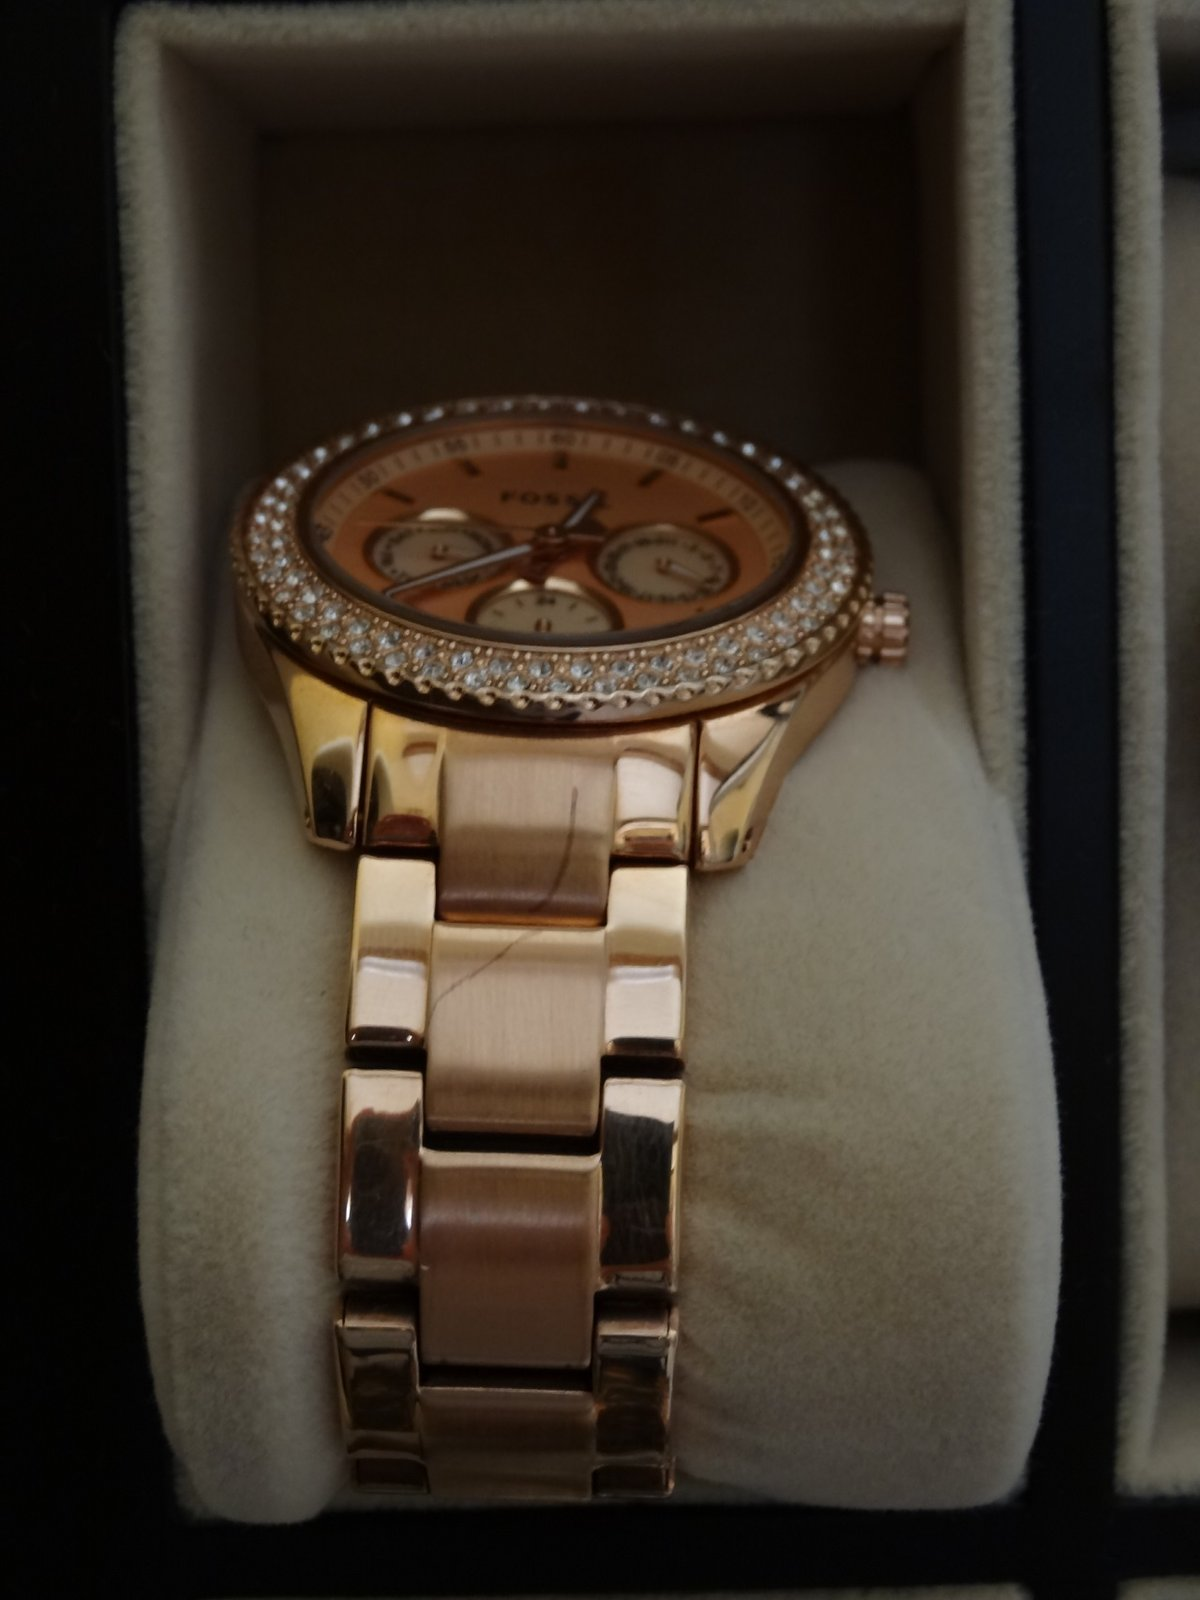 Damenuhren fossil rosegold  Erledigt] Fossil Damenuhr Rosé Gold - Chrono Stella ES3003 - UhrForum